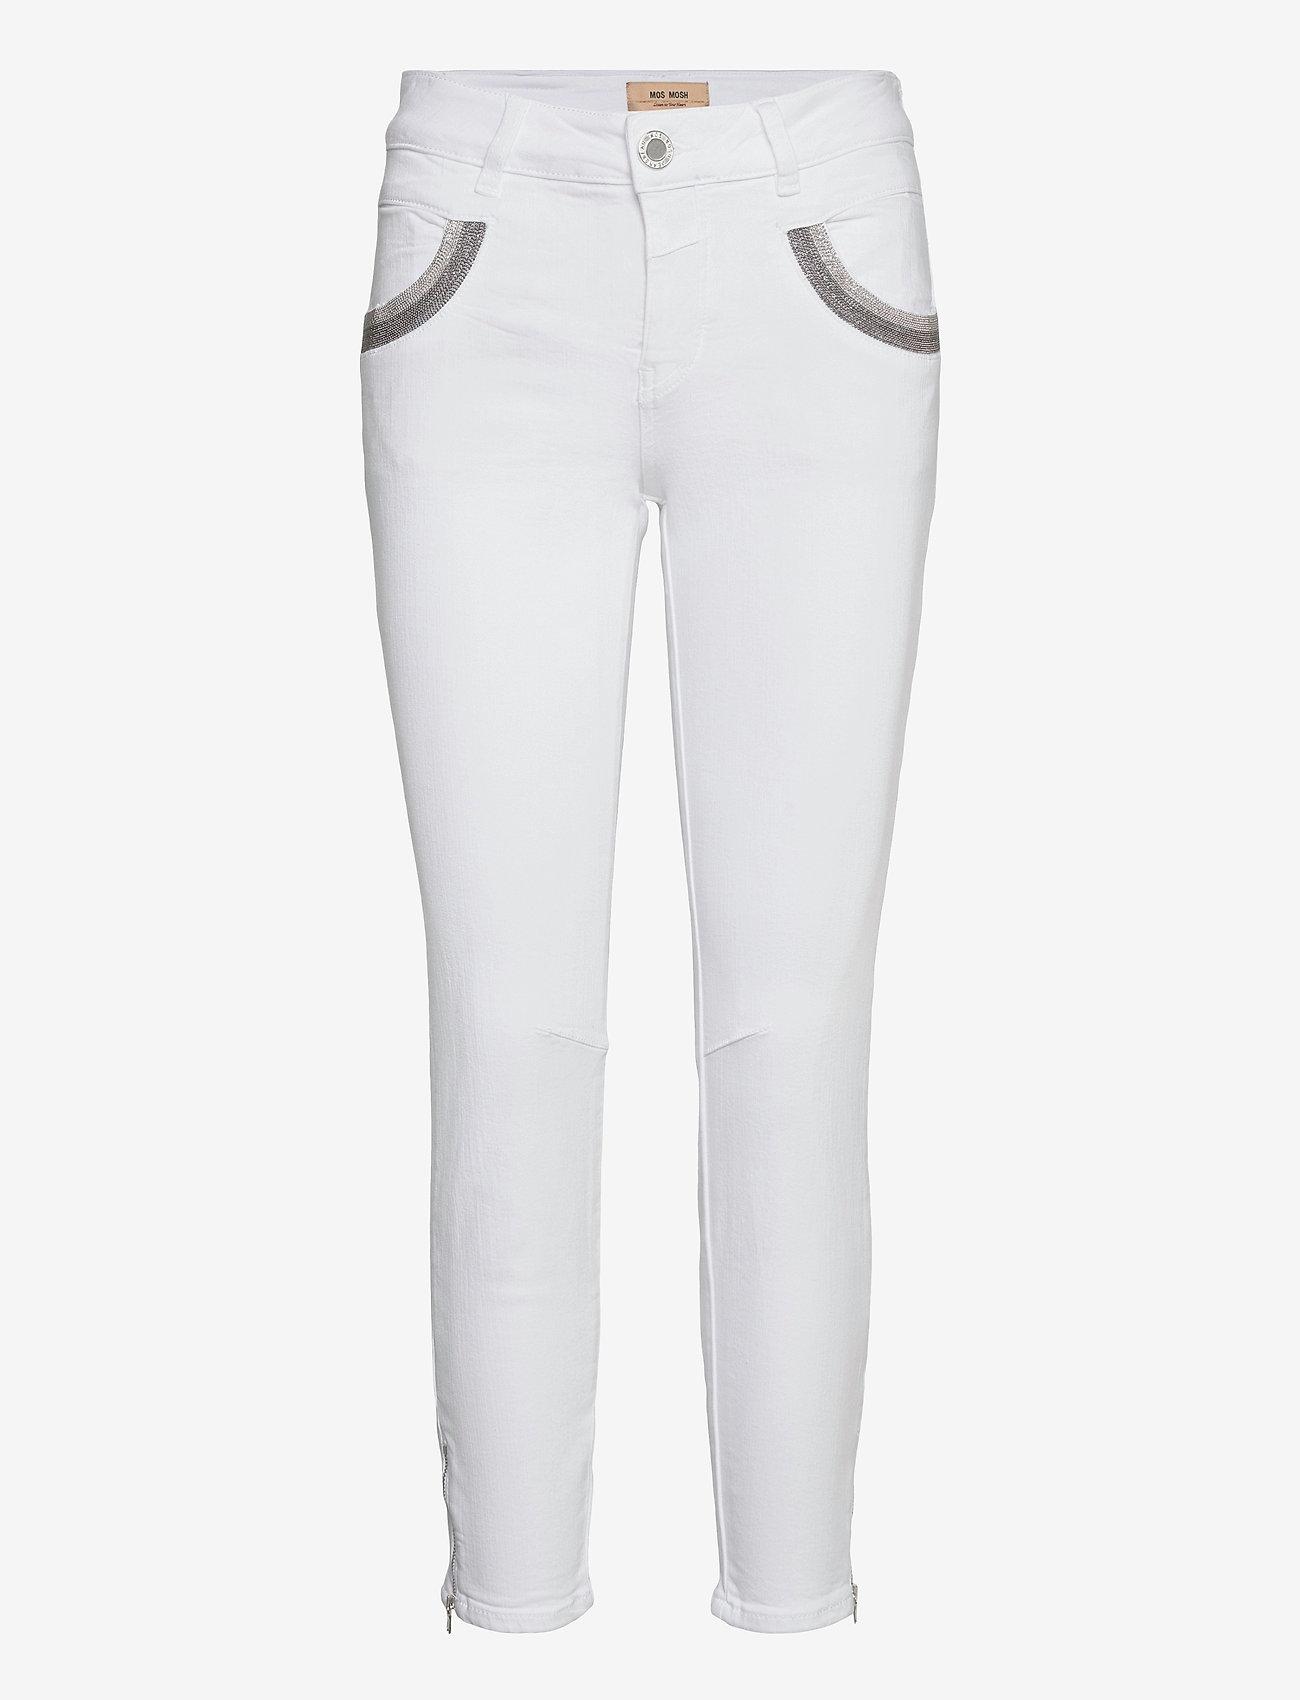 MOS MOSH - Naomi Shade White Jeans - slim jeans - white - 0